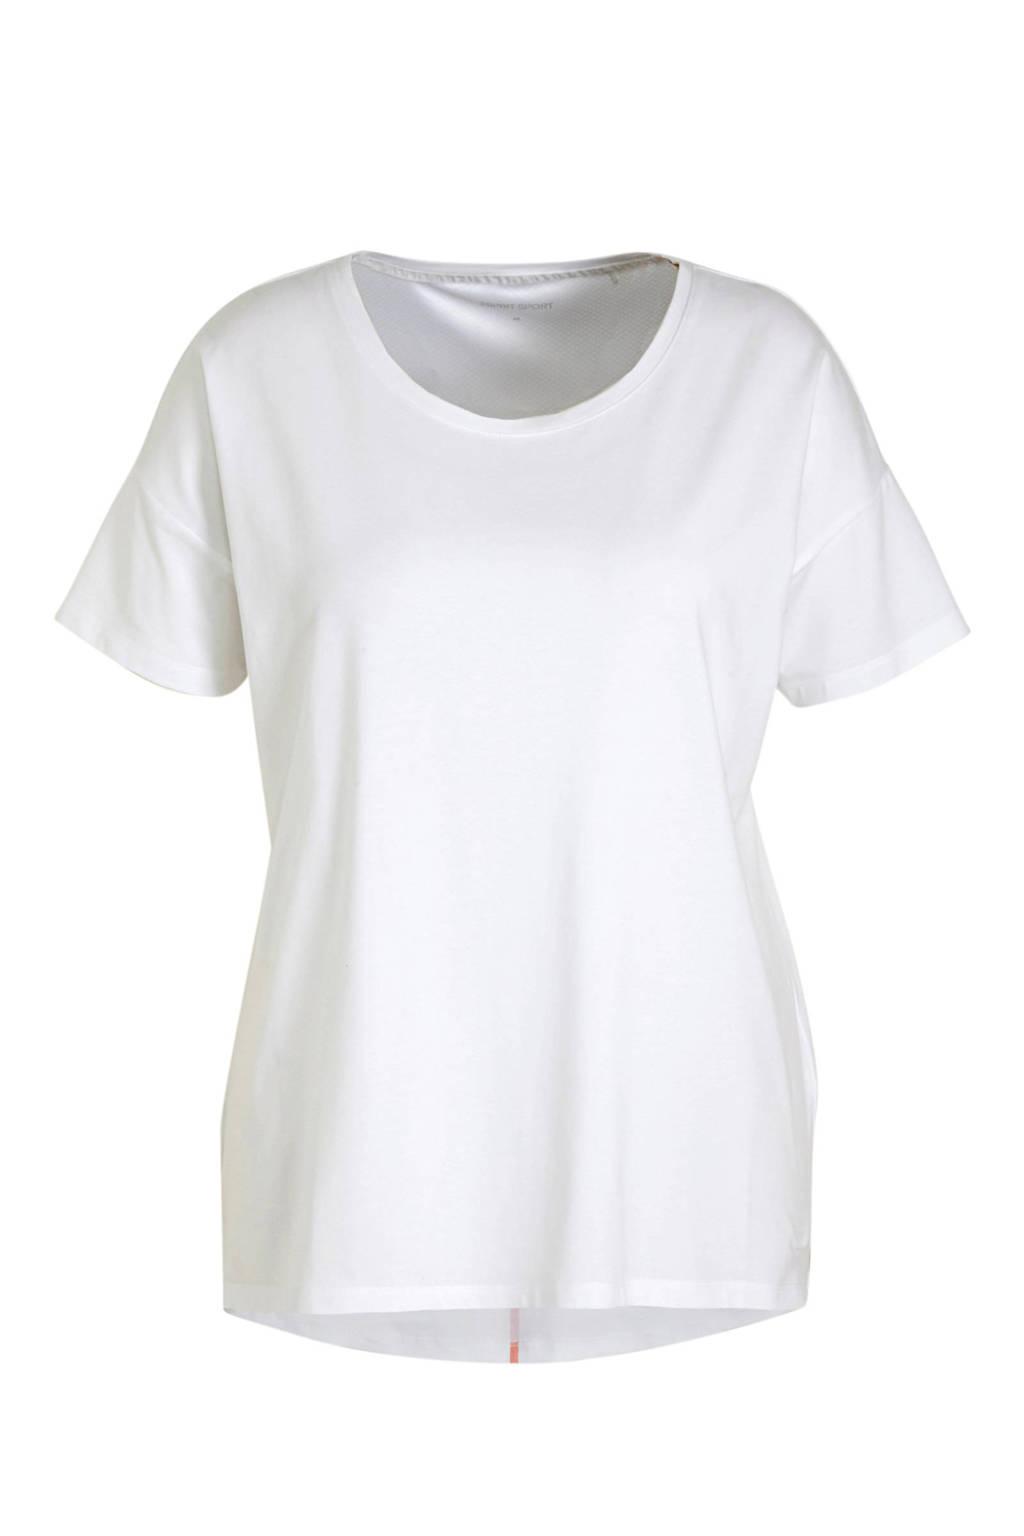 ESPRIT Women Sports sport T-shirt wit, Wit